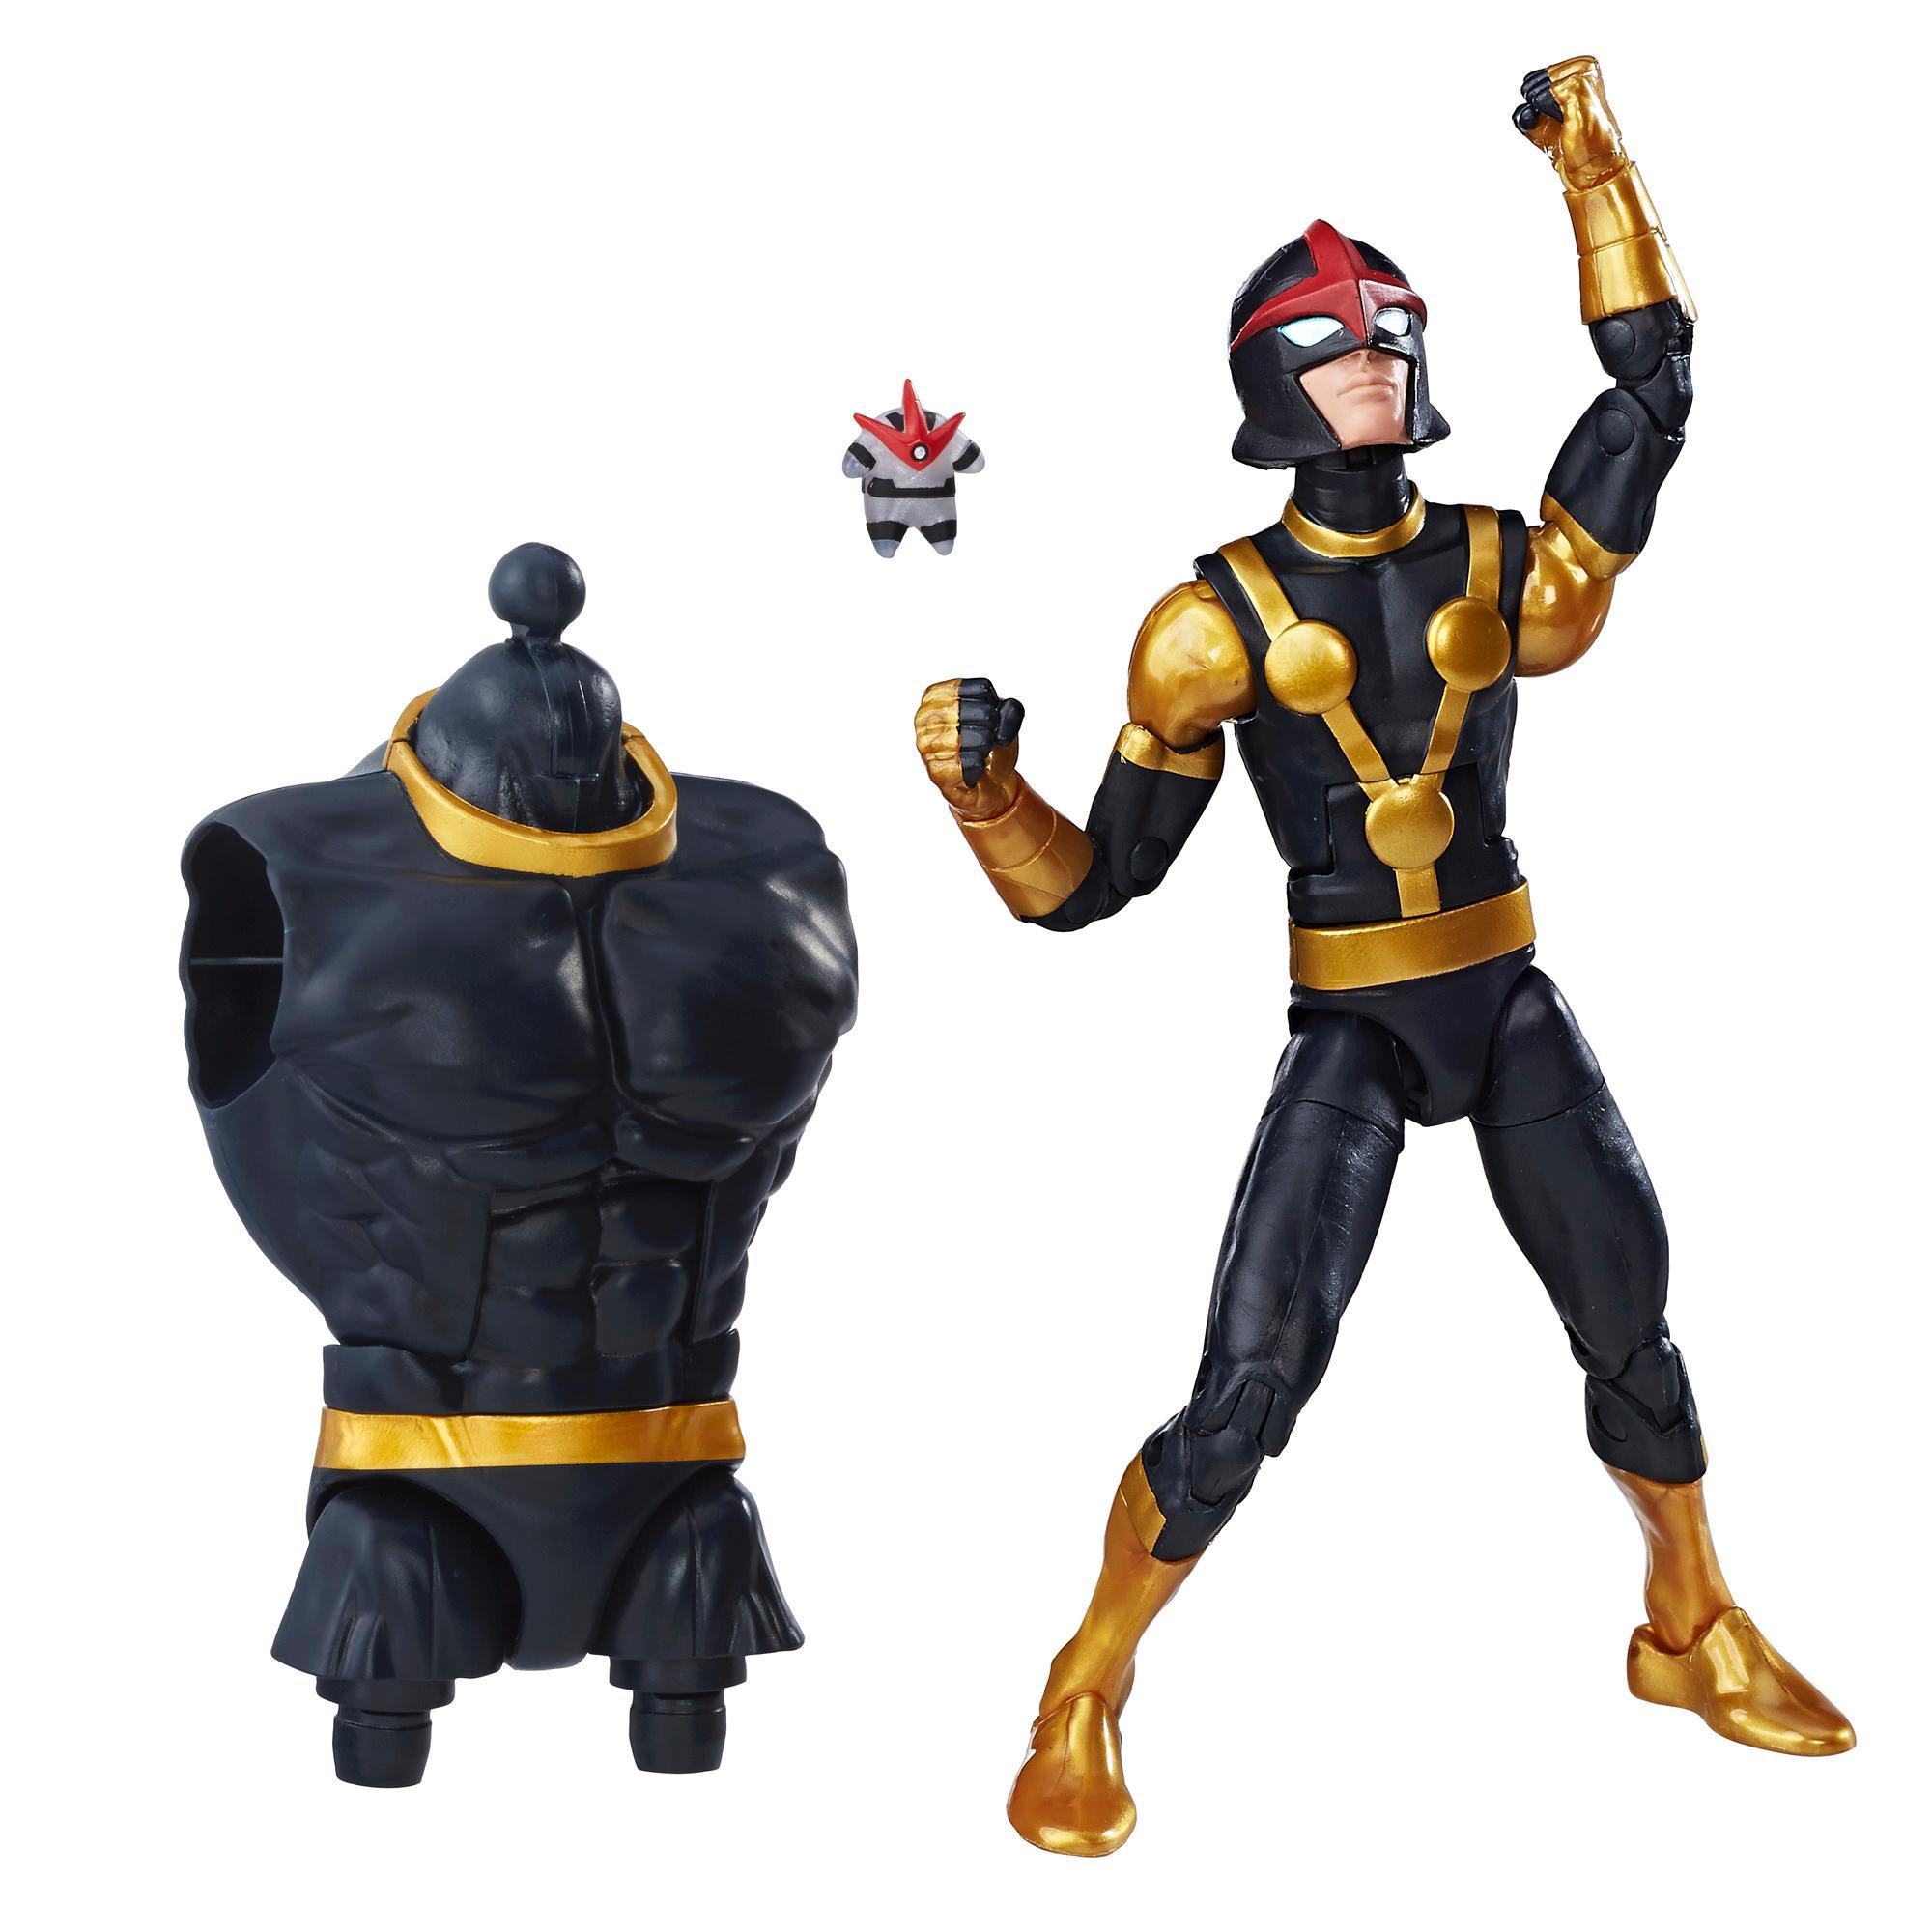 Marvel Guardians of the Galaxy 6-inch Legends Series Marvel's Kid Nova